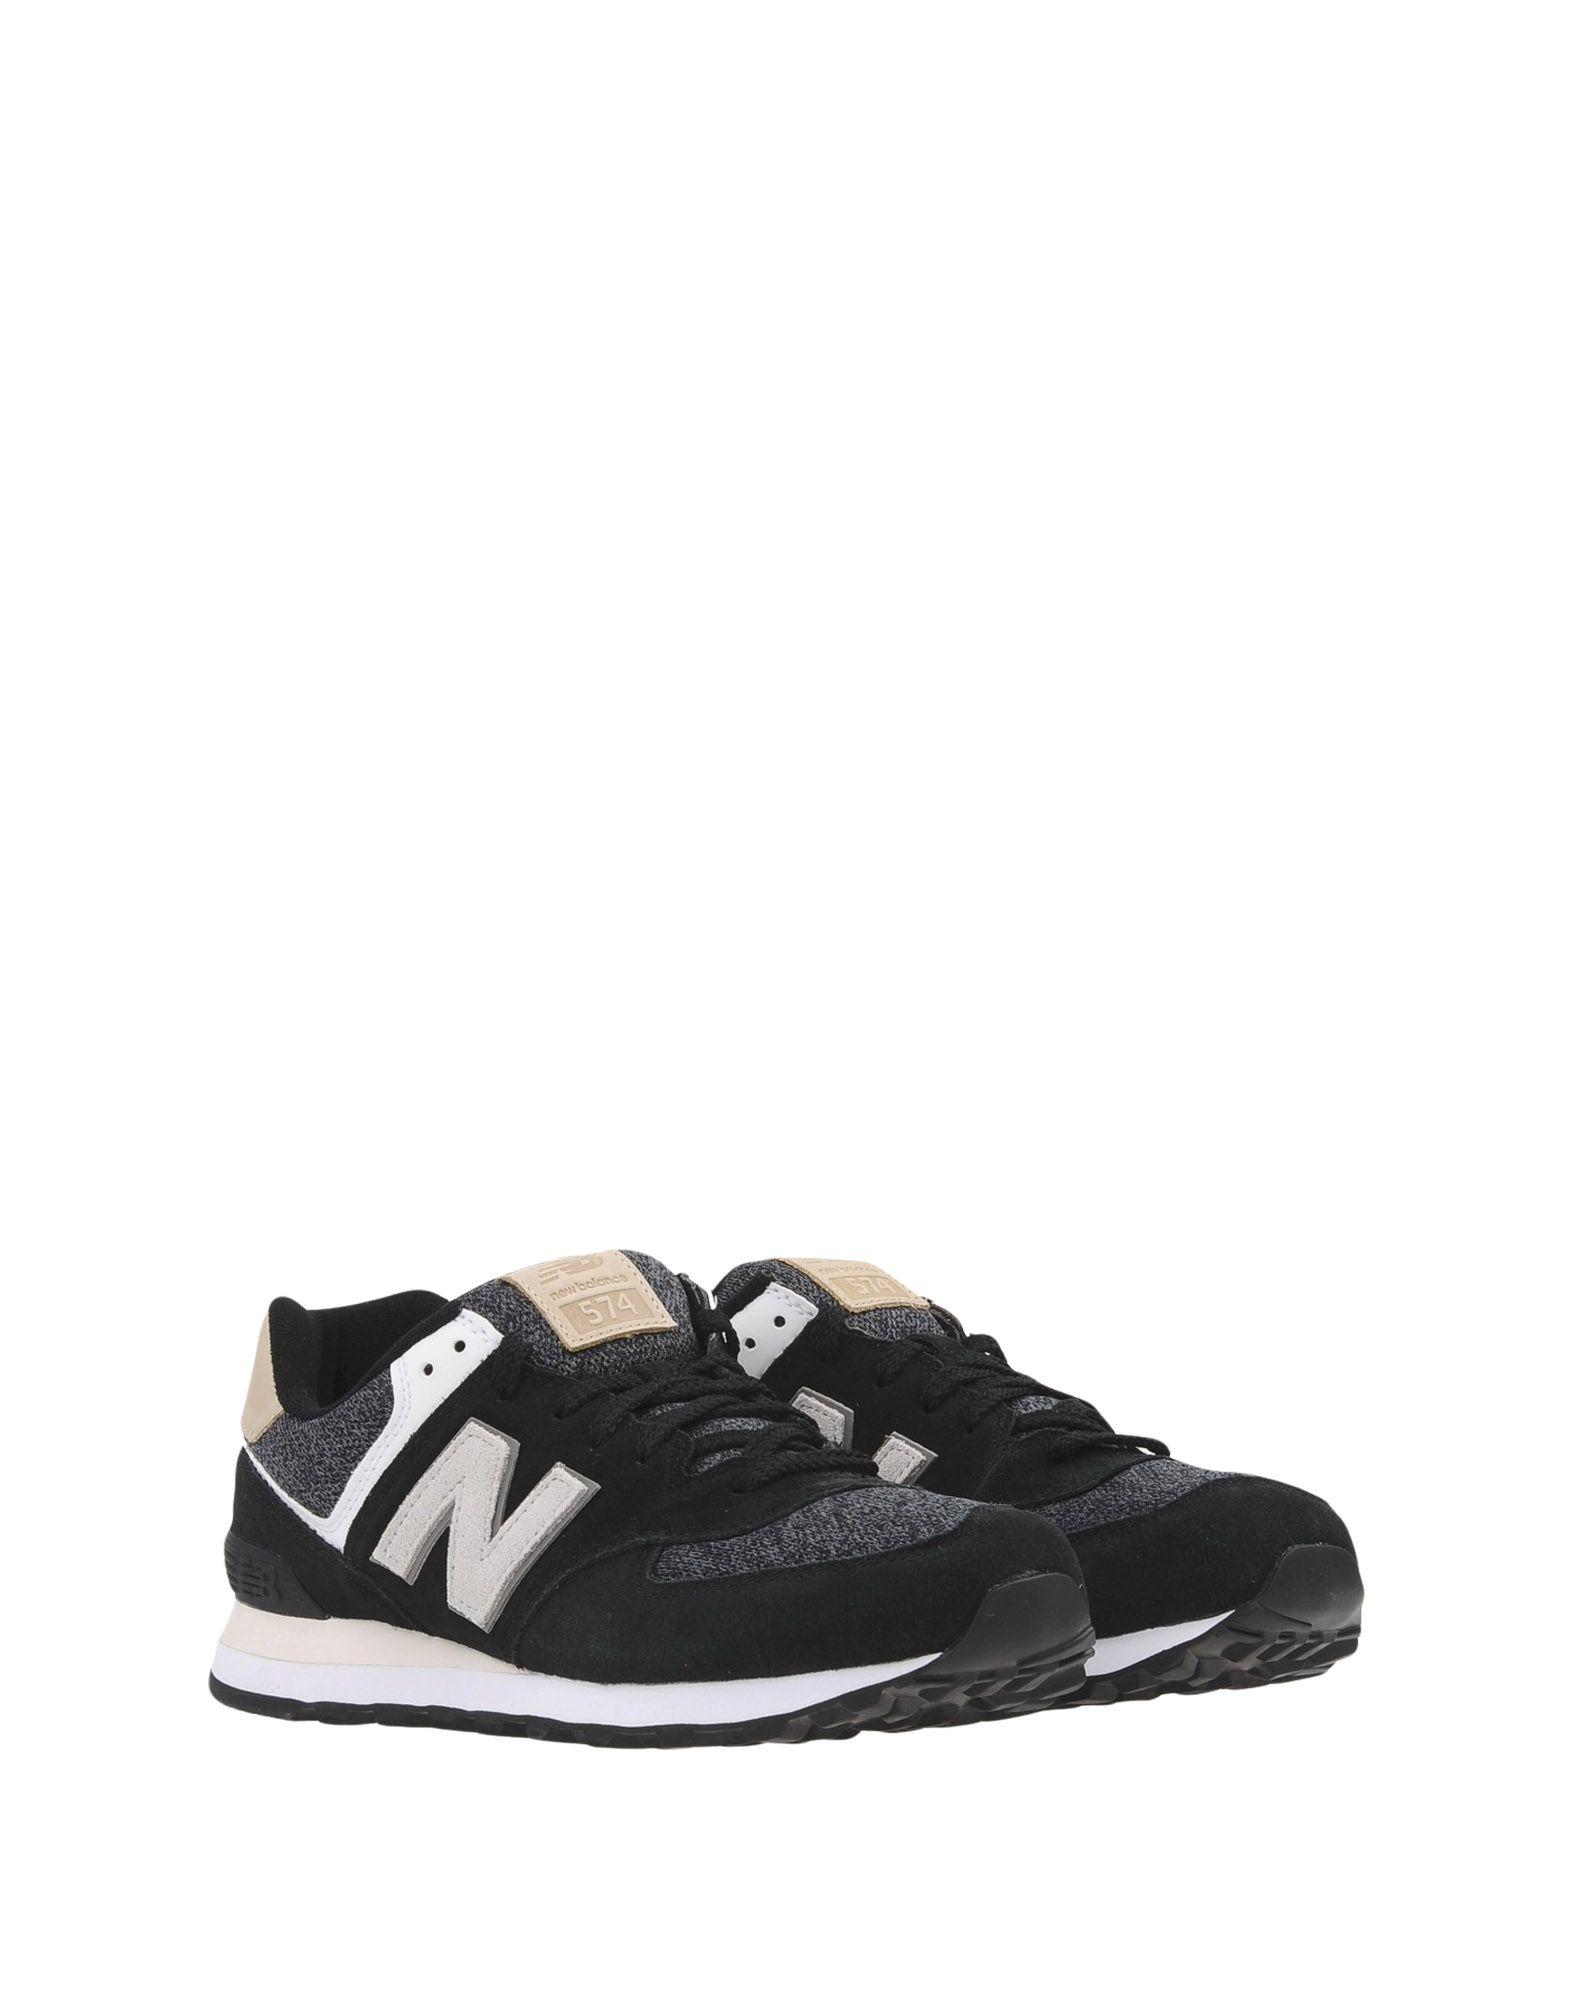 New Balance 547 Textile  11333467JC Neue Schuhe Schuhe Neue 7af8e9